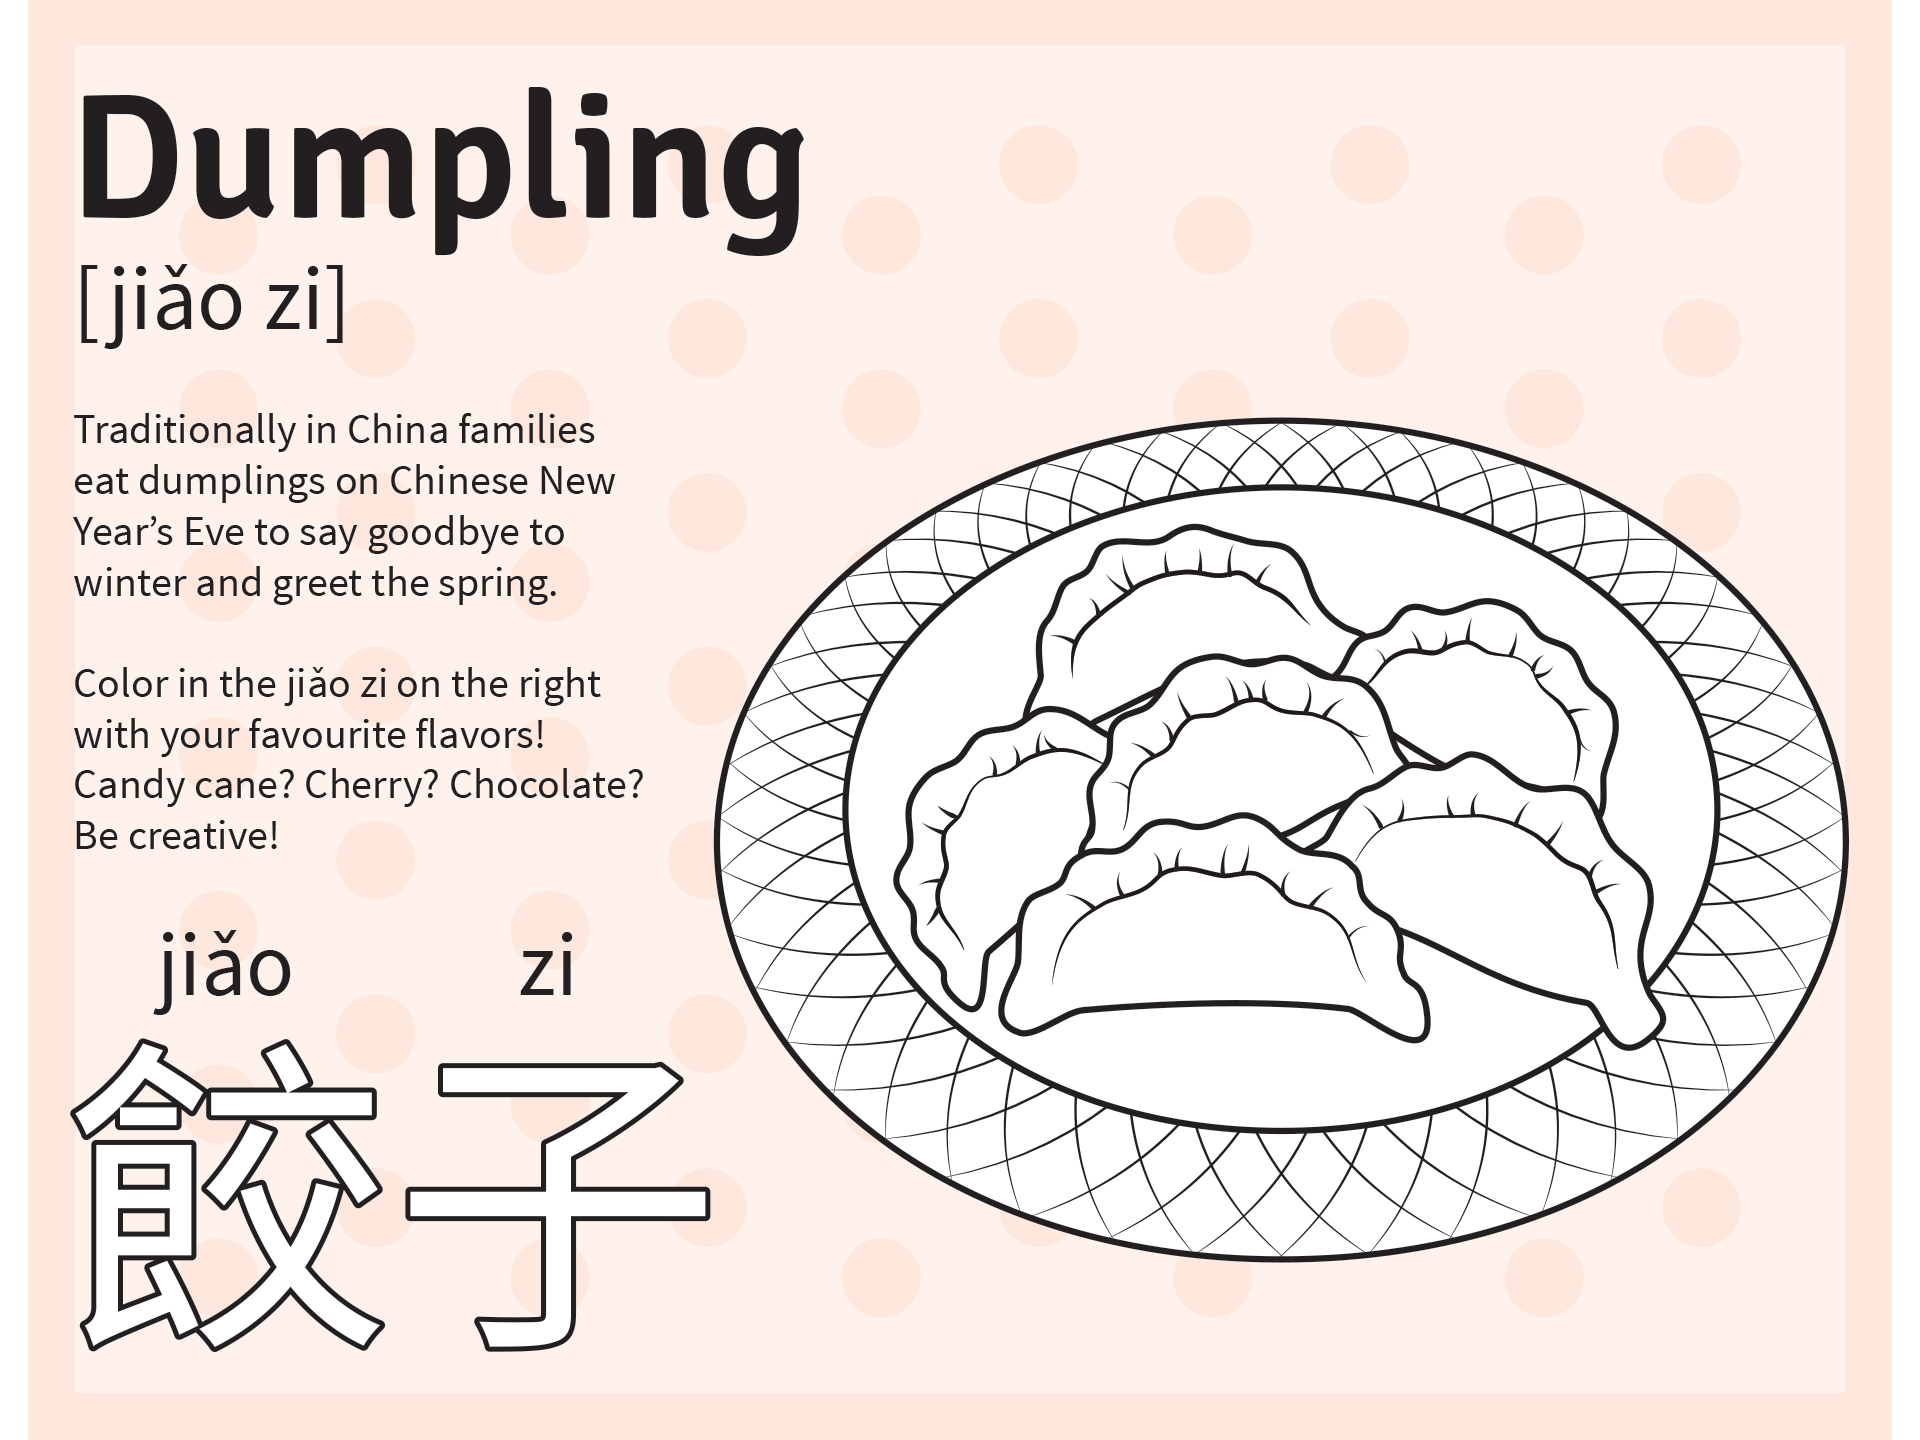 Learn The Mandarin Word For Dumplings In This Fun Activity